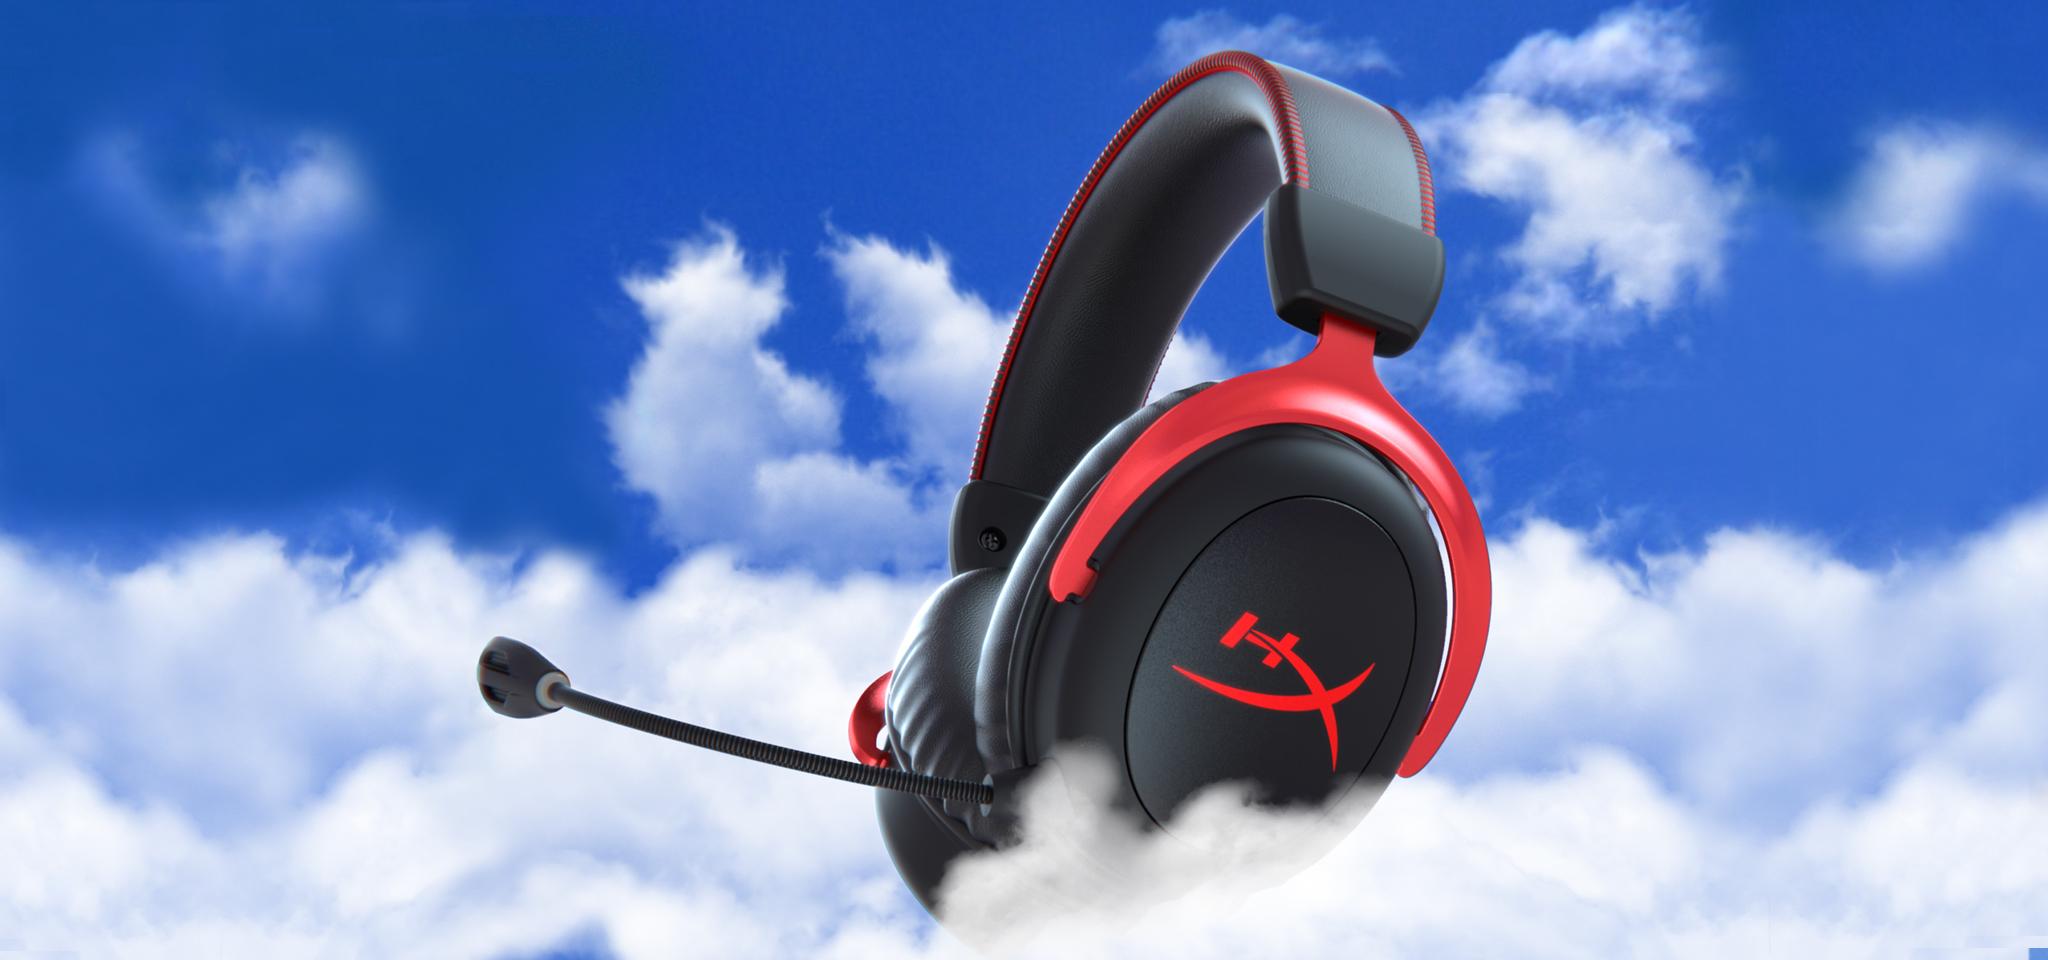 Cloud Gaming Headsets - Cloud II Wireless| HyperX $119.99